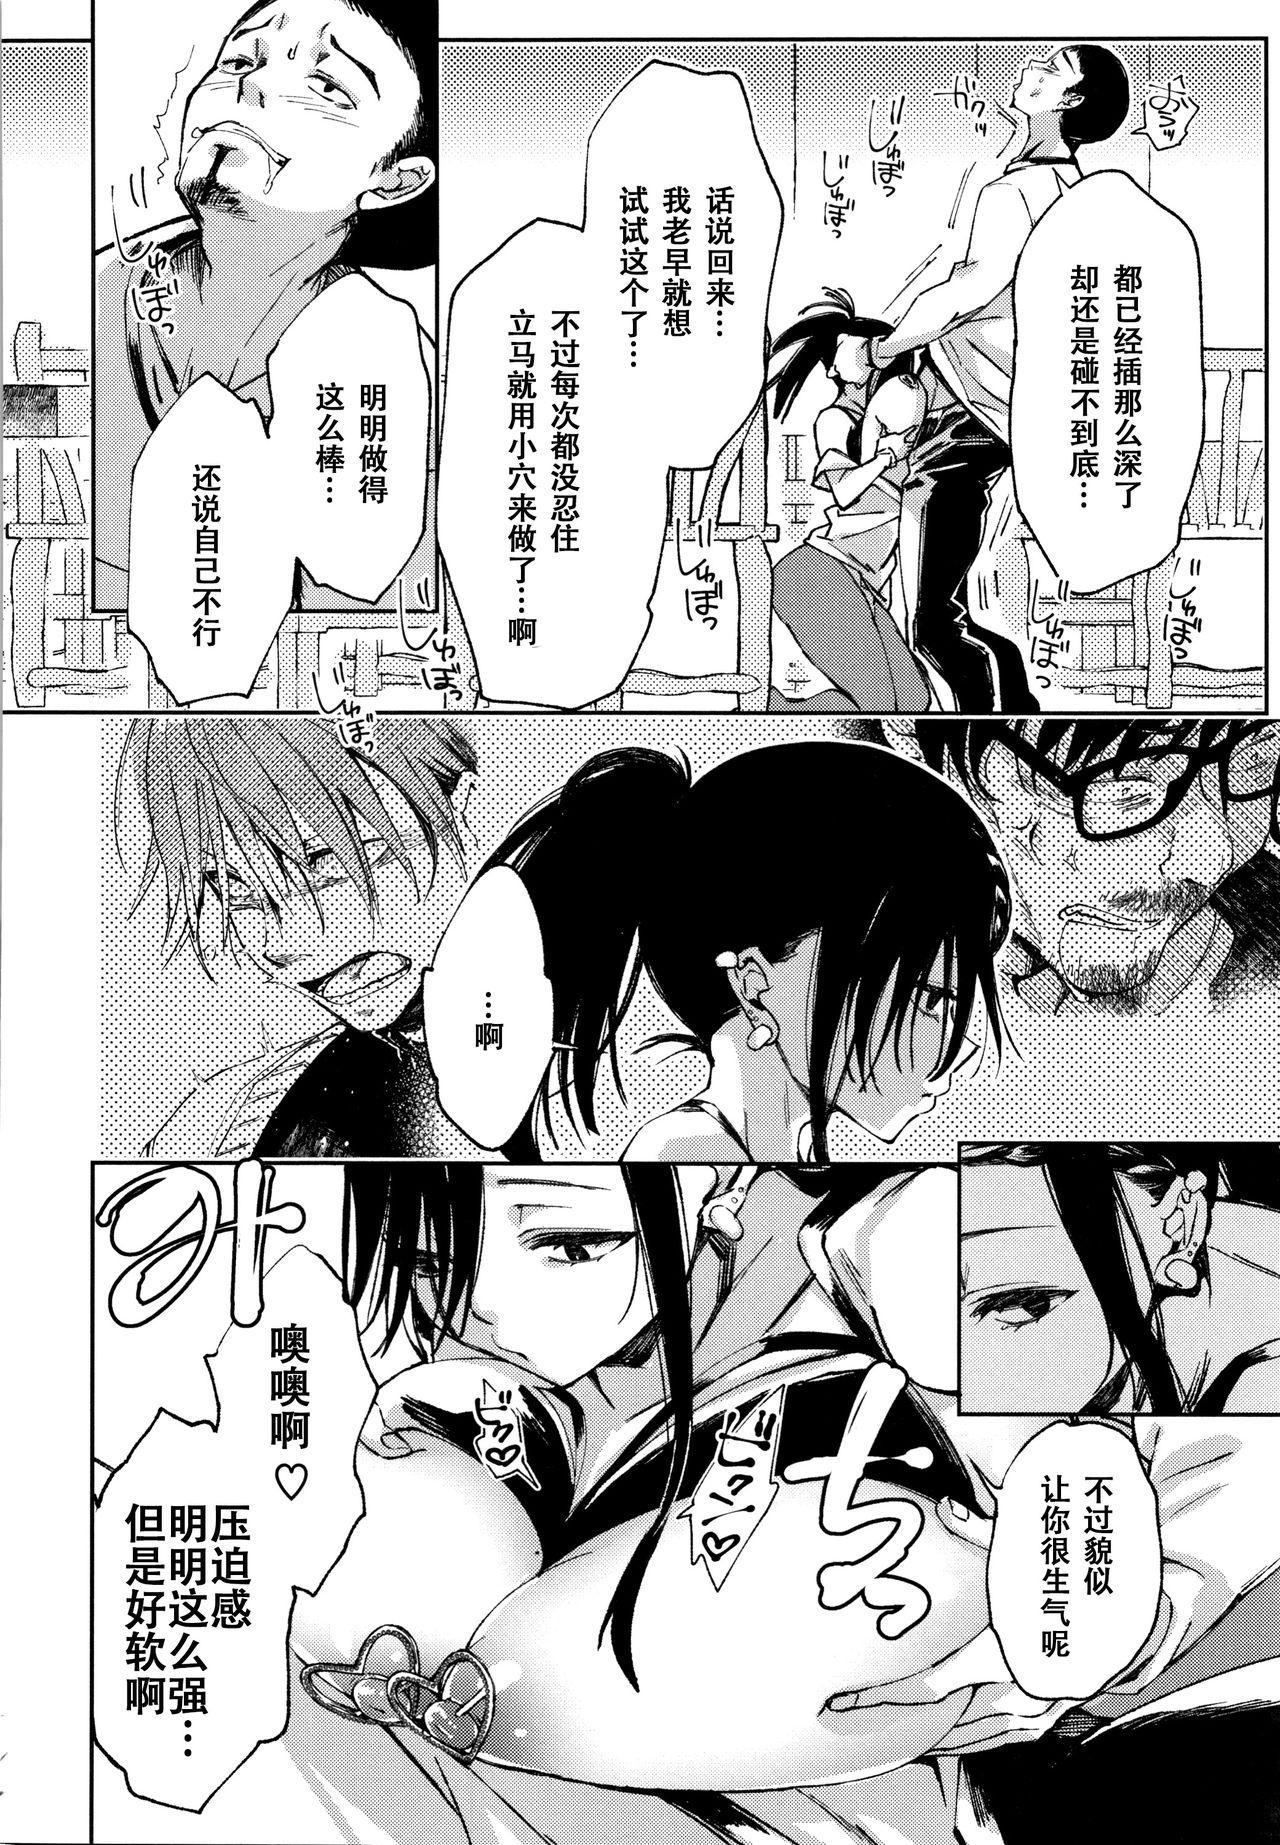 [Achumuchi] Saijaku Gal wa Ikizurai! - The weakest pussy is hard to go.ch.1-8 [Chinese] [战栗的玻璃棒汉化] [Ongoing] 180